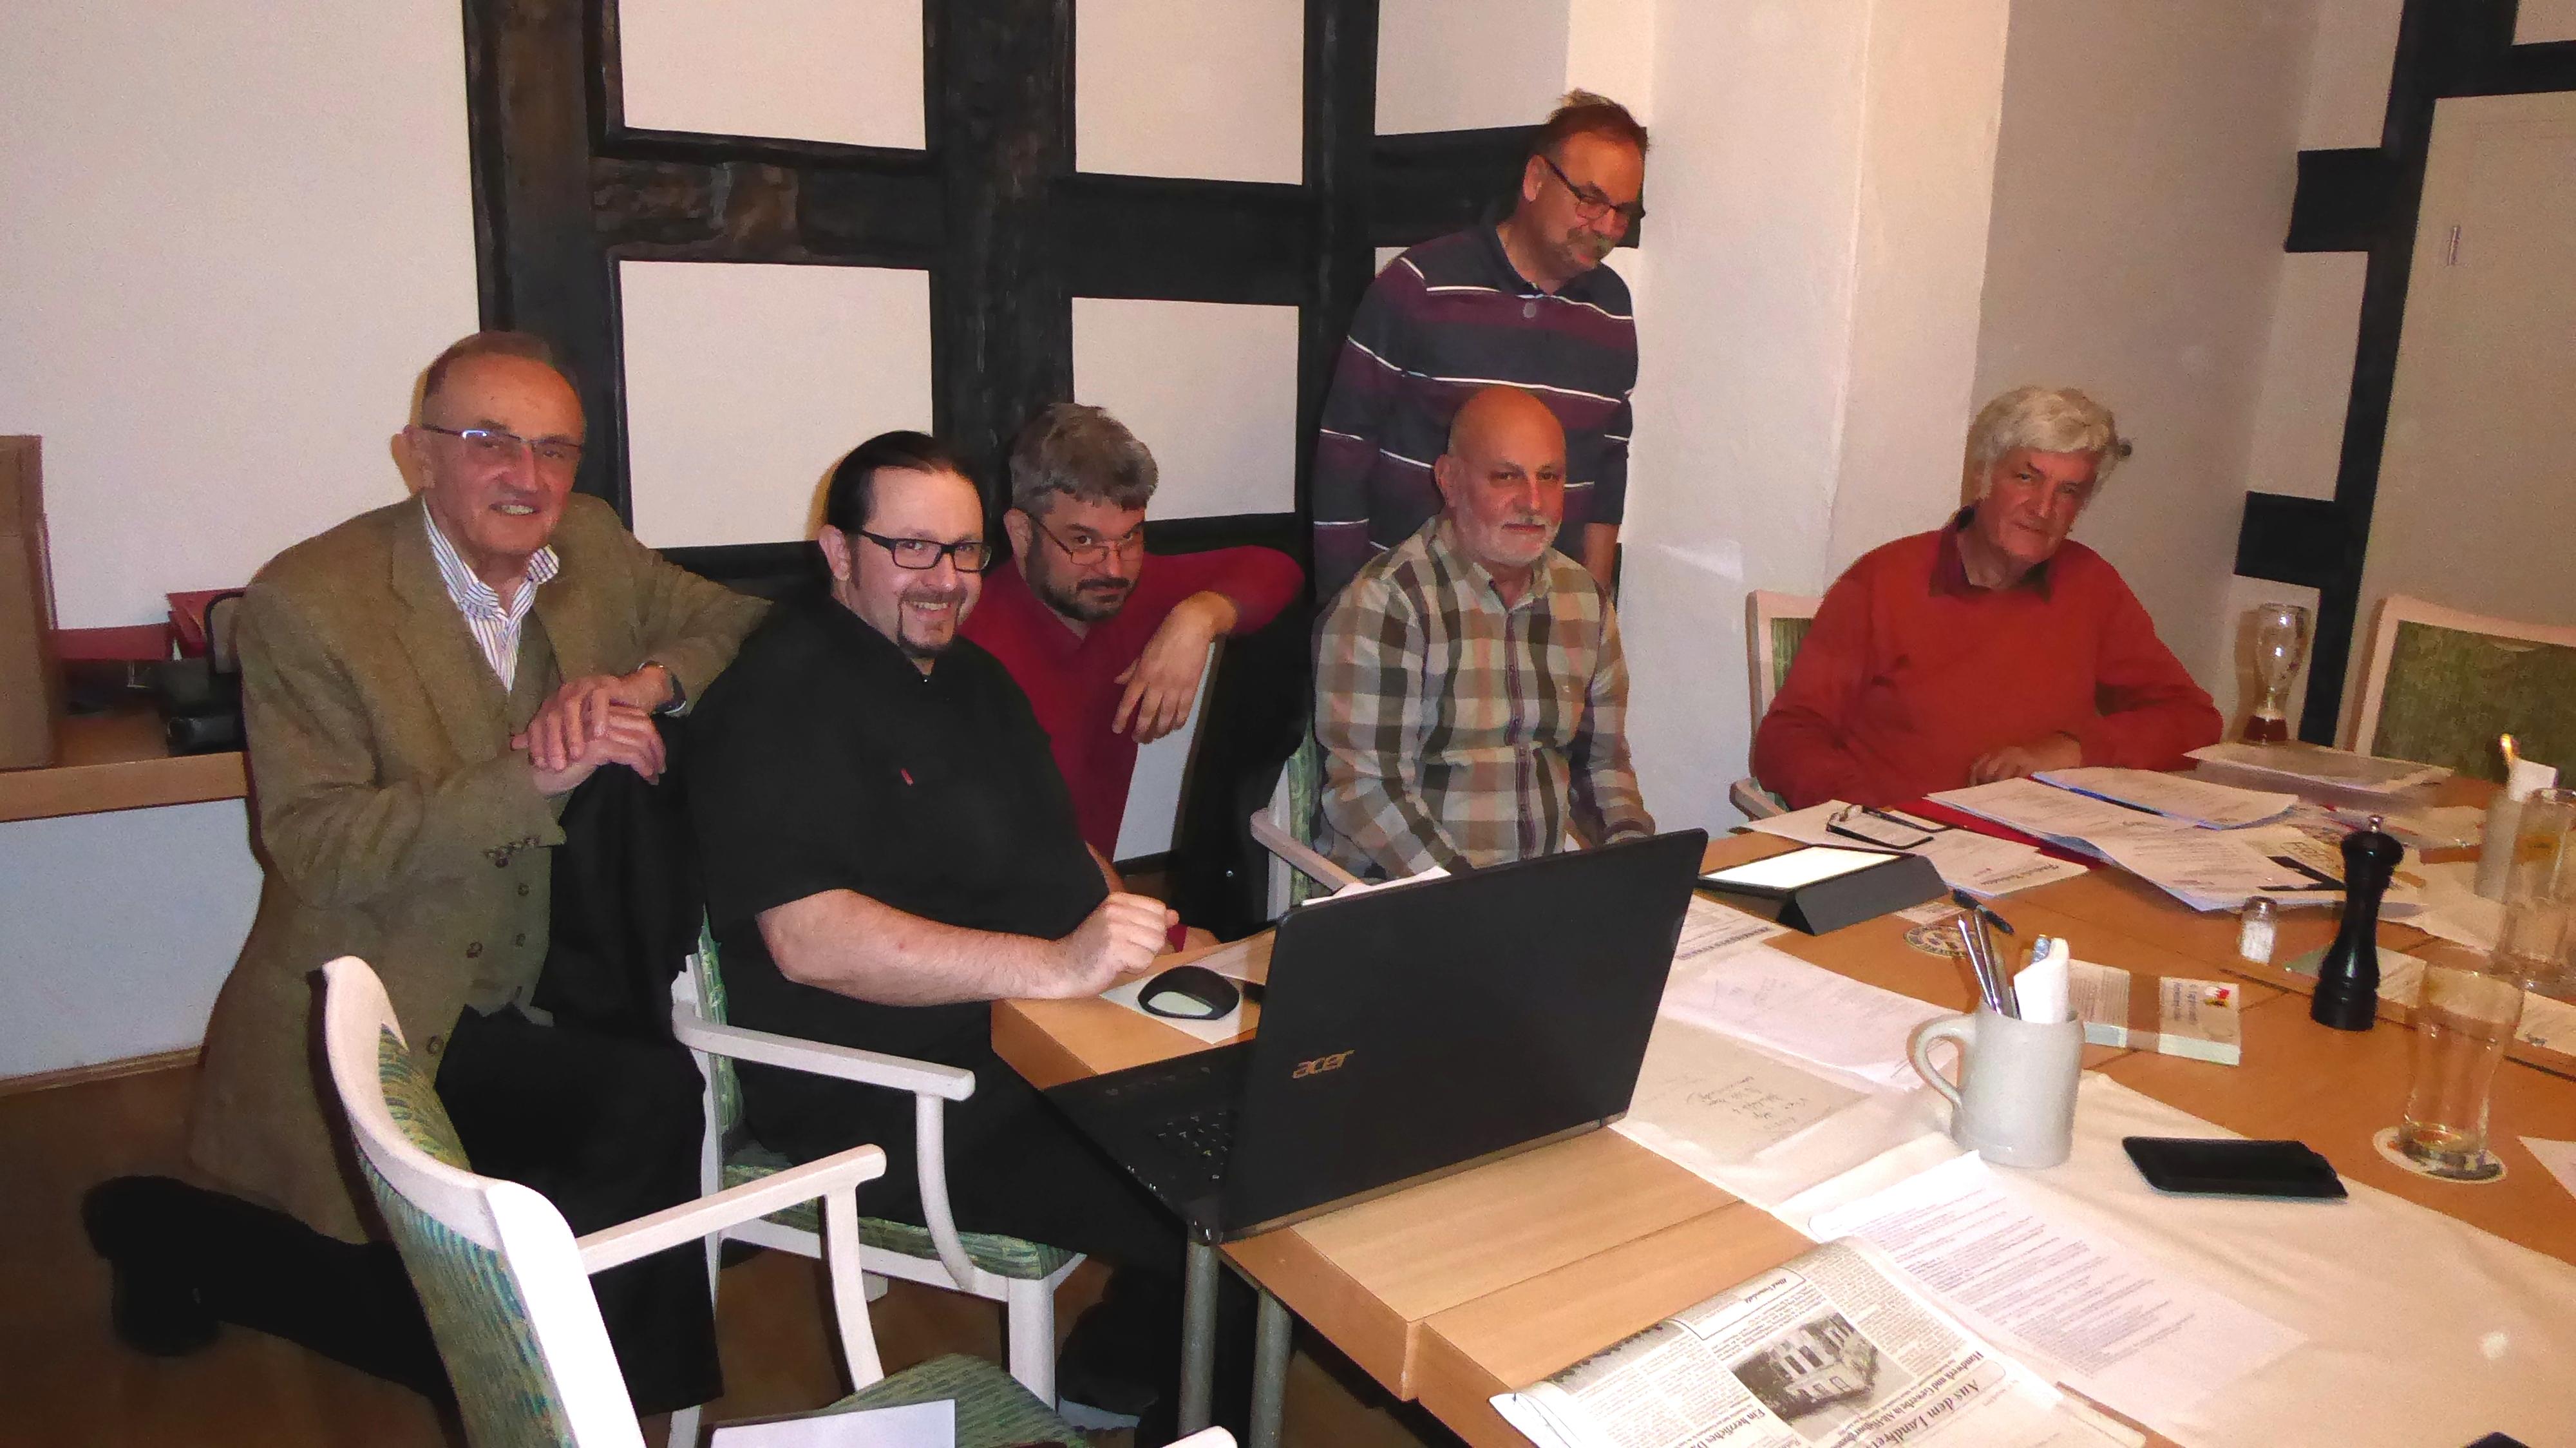 2017-04-20 Vorstandssitzung Memmelsdorf